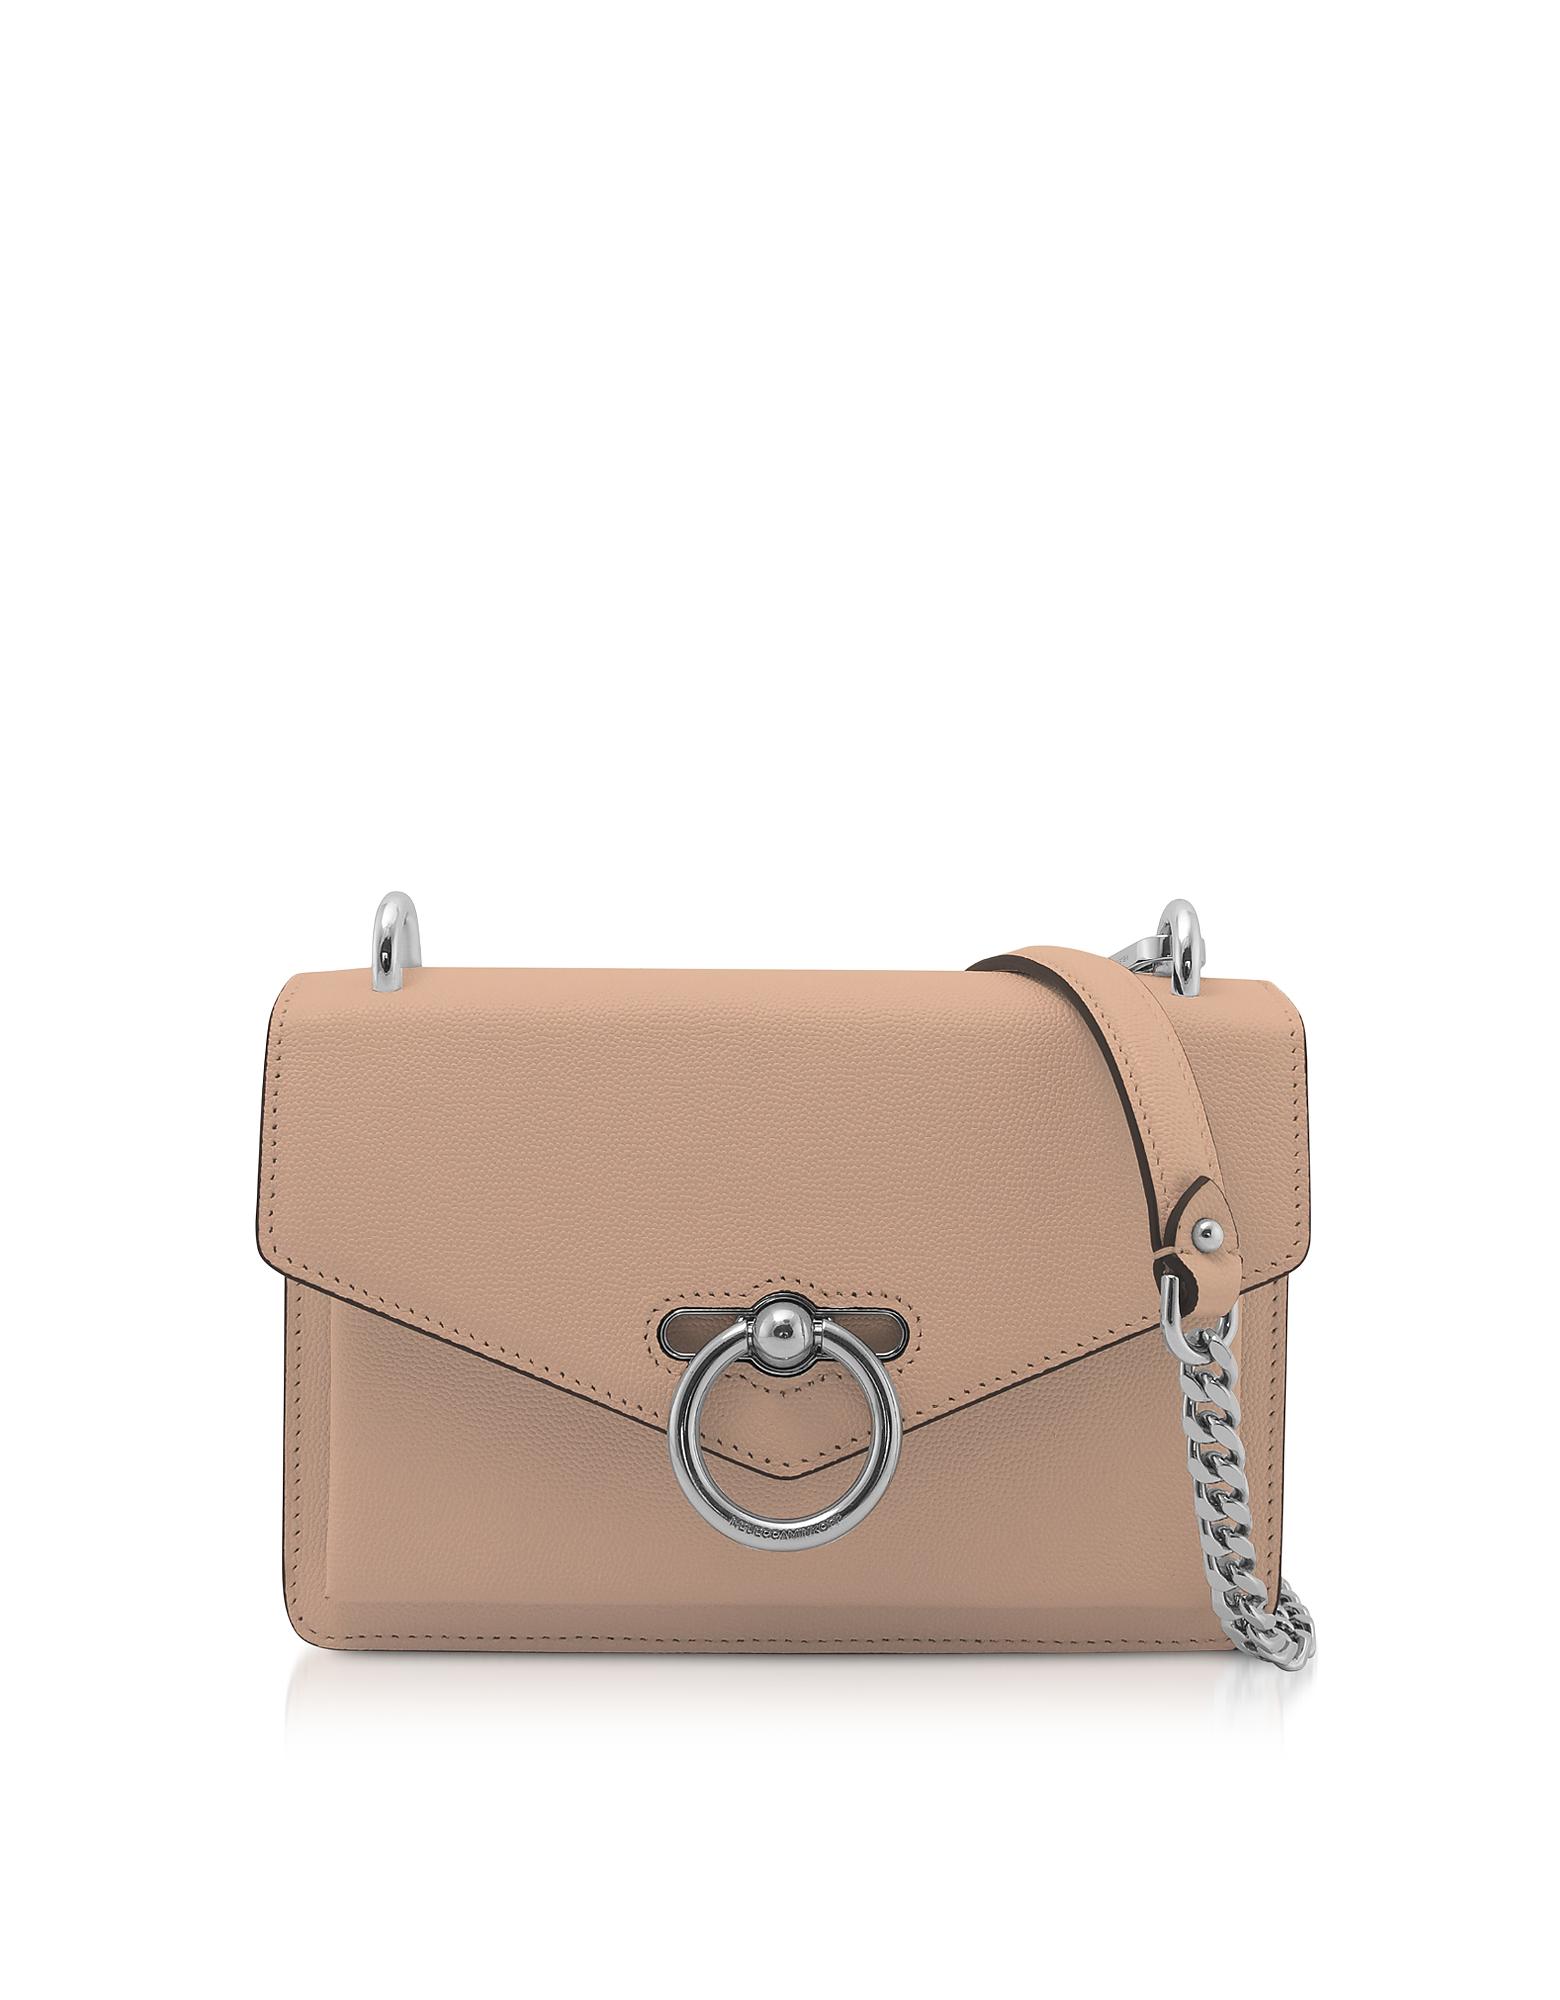 Rebecca Minkoff Handbags, Caviar Leather Jean Xbody Bag